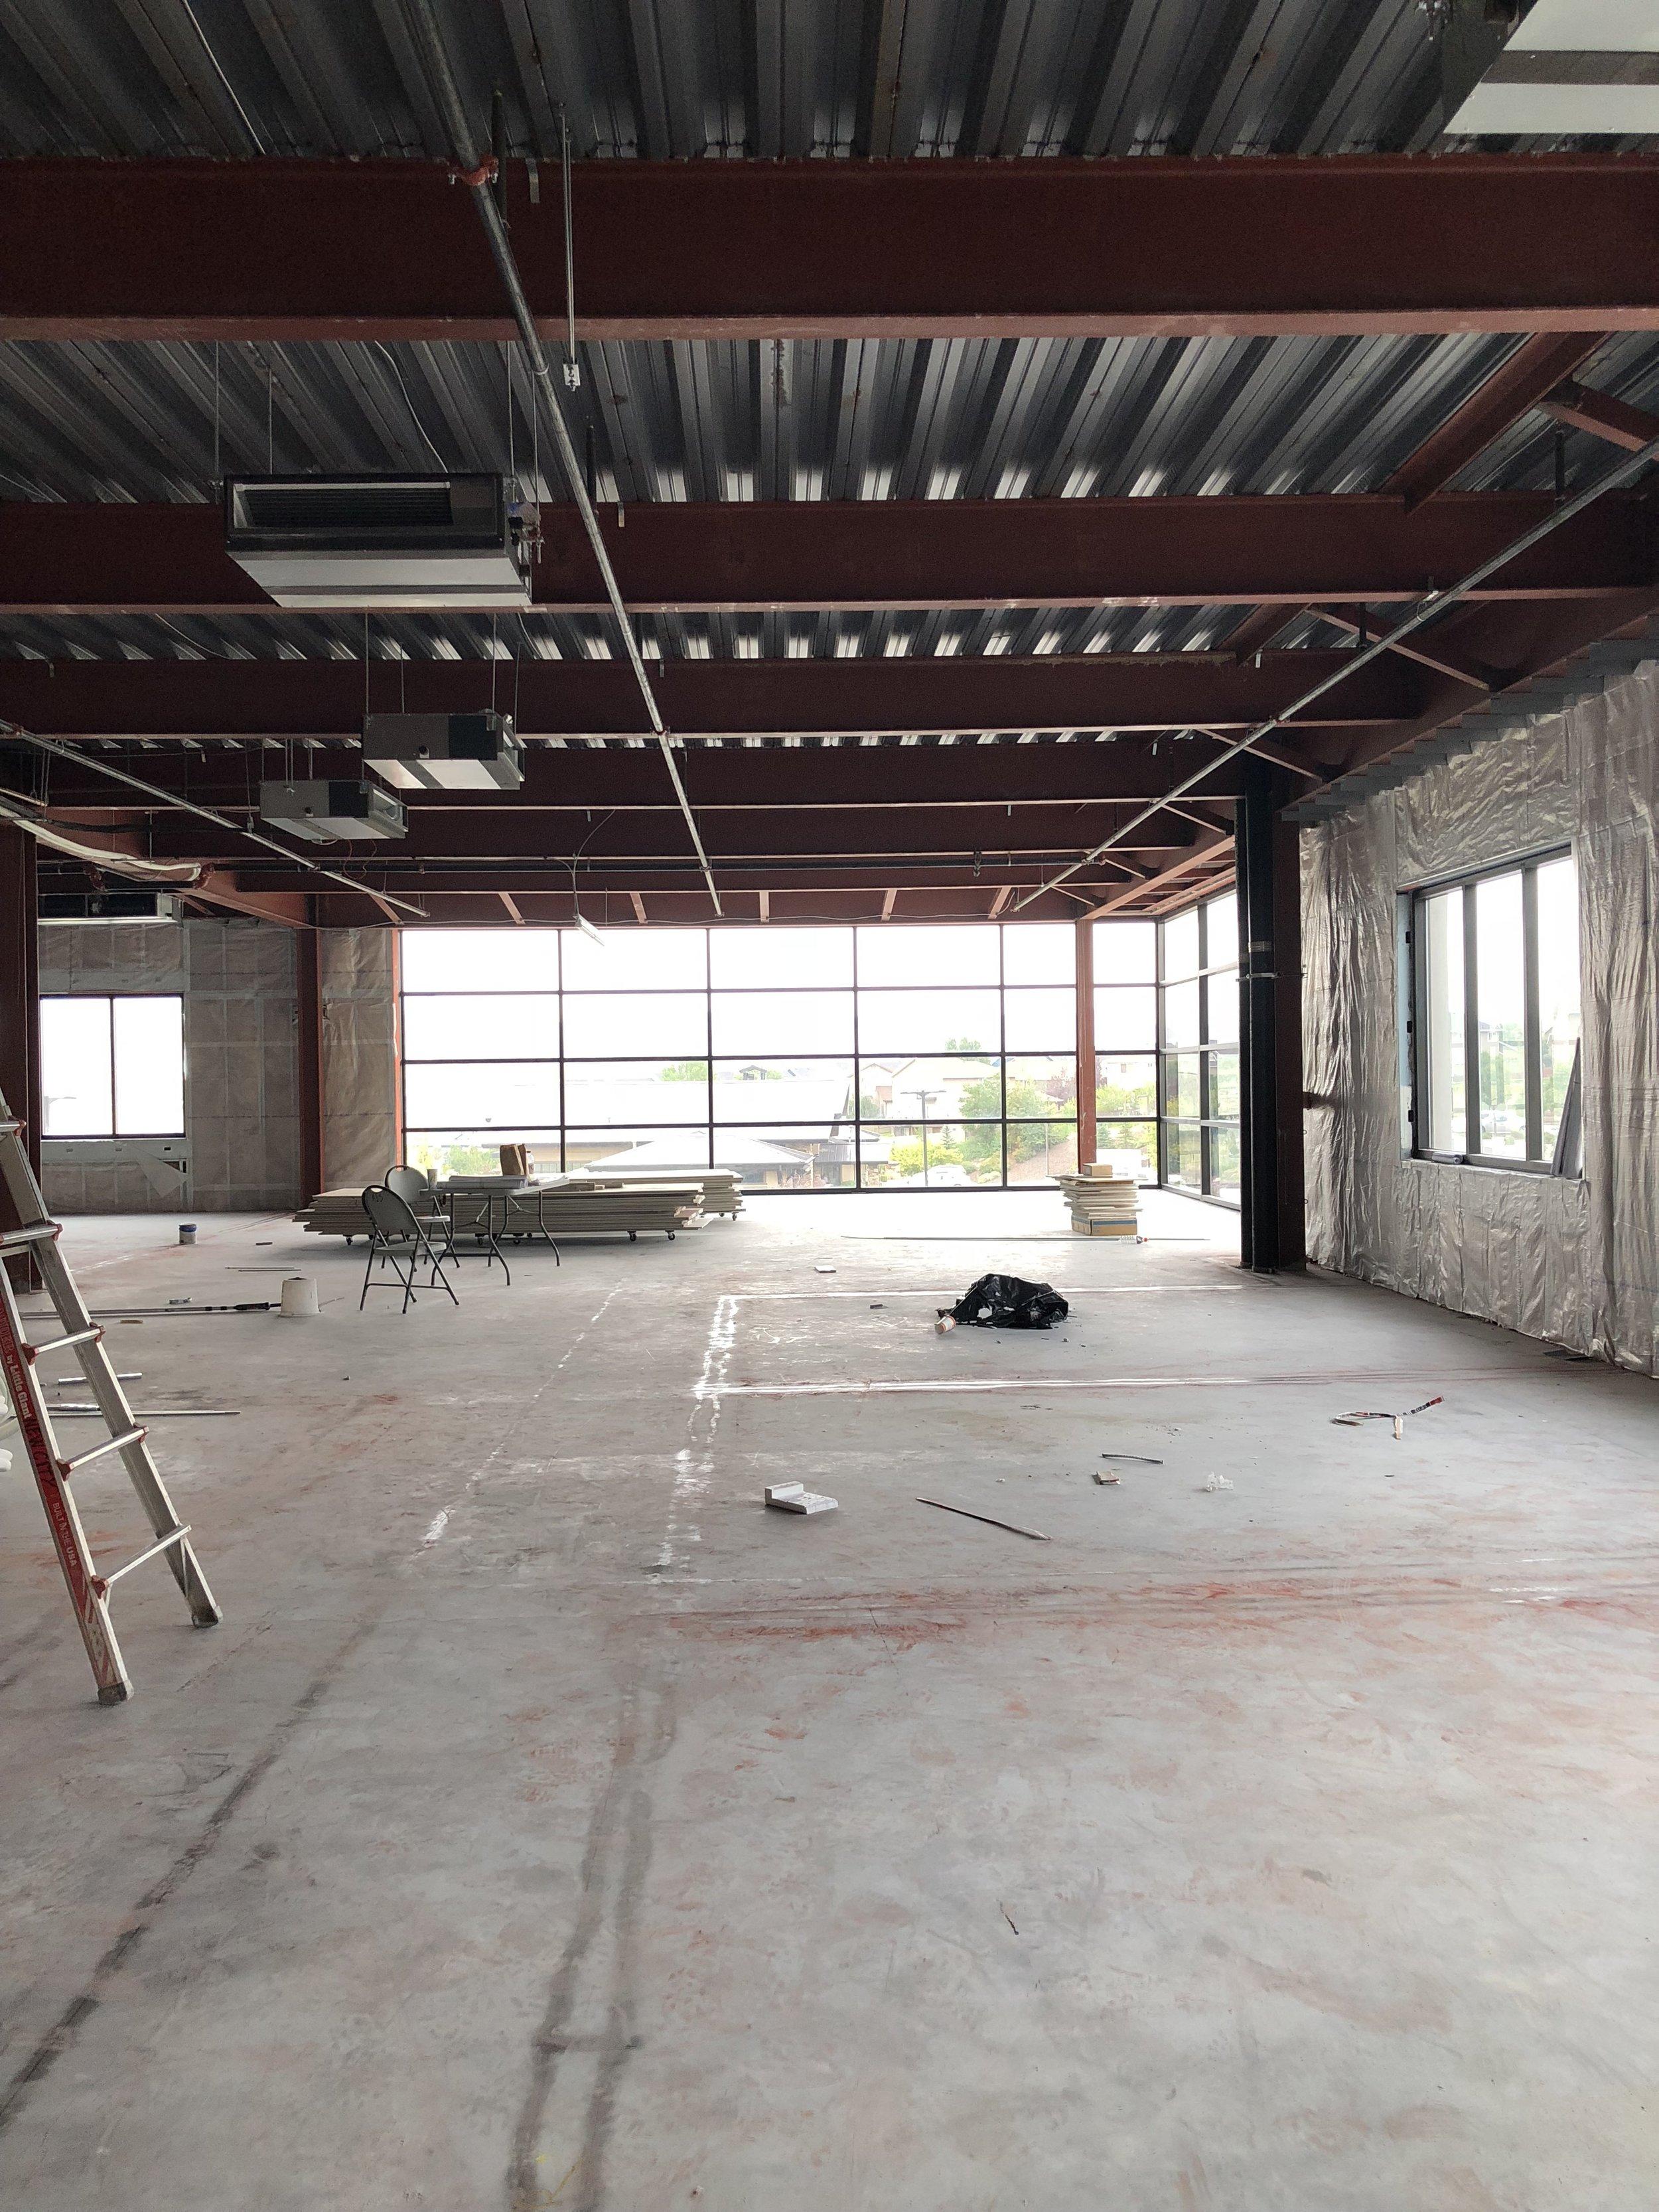 Studio McGee's New Office Space